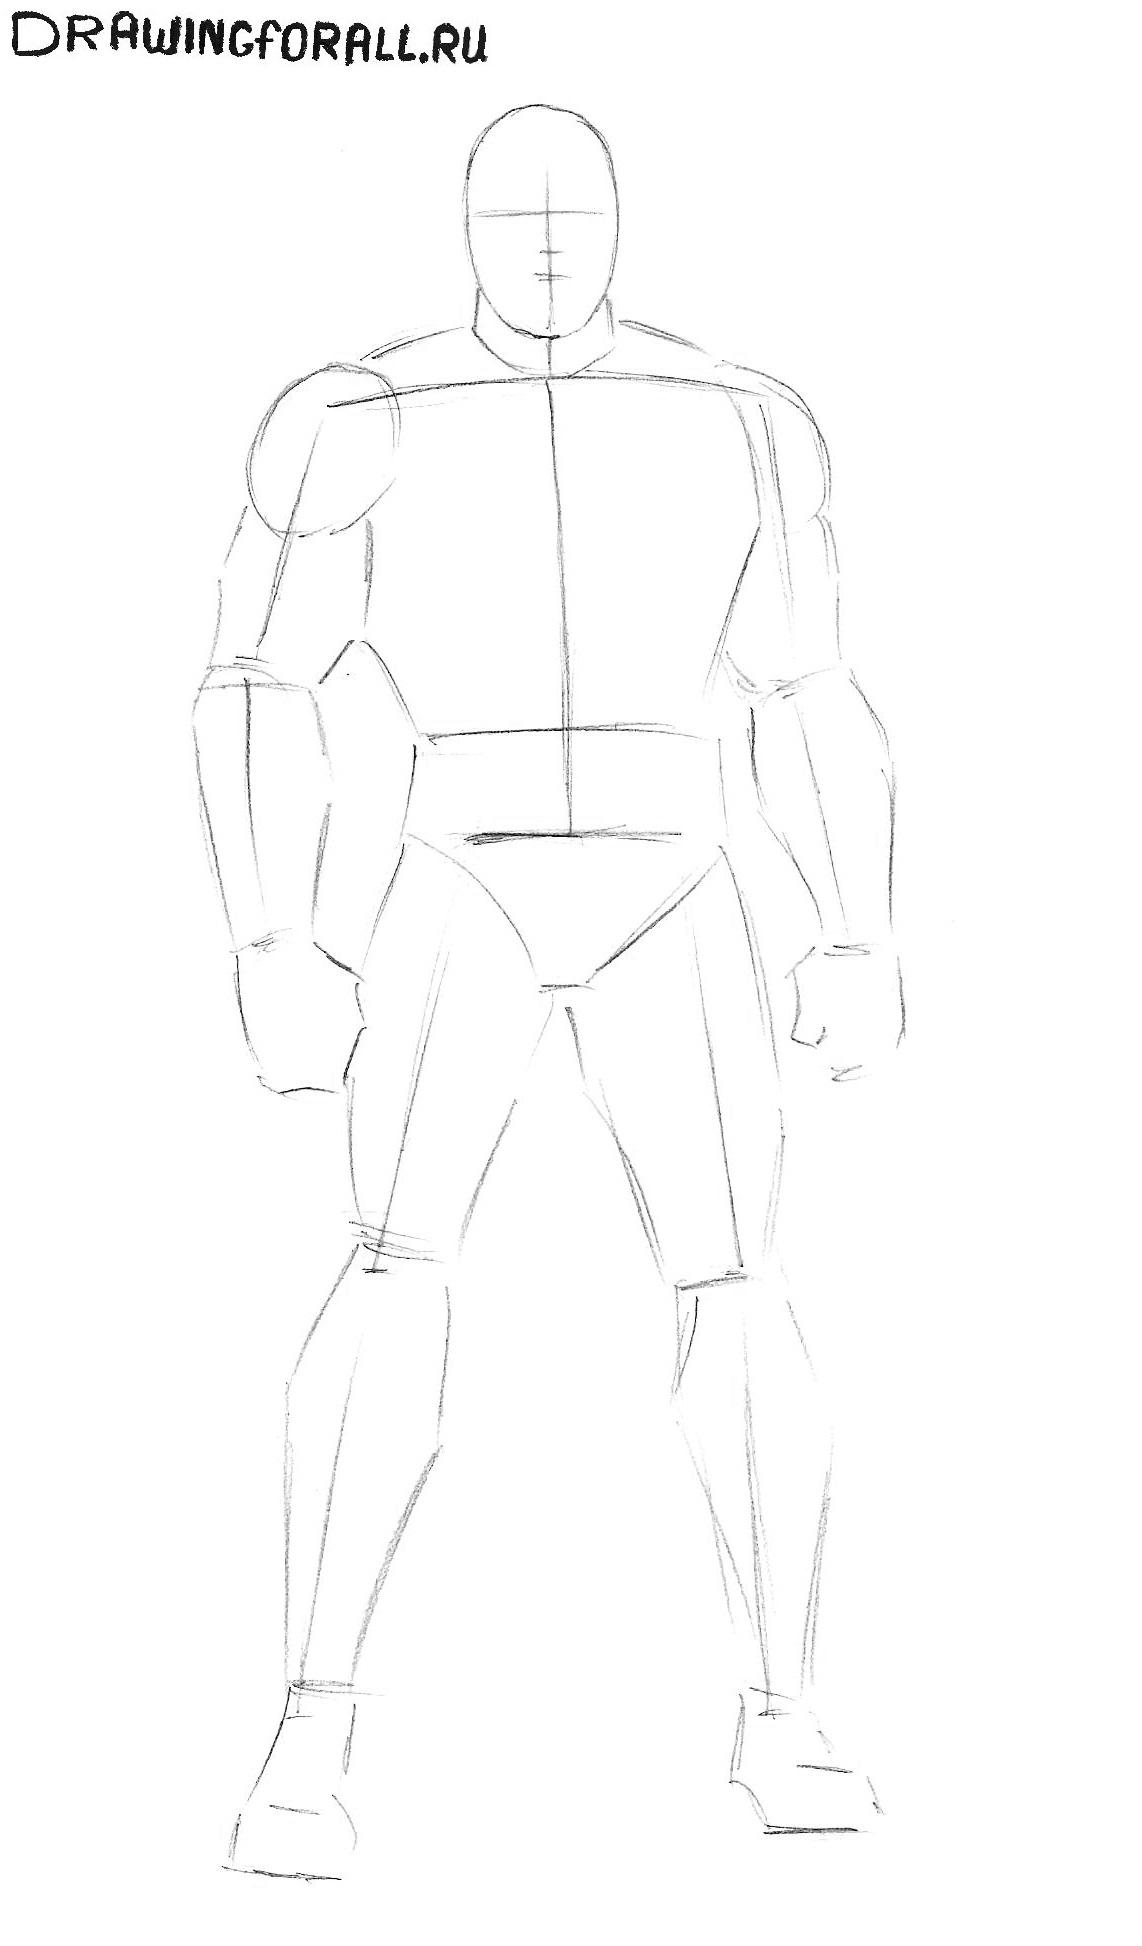 Как нарисовать капитана америка карандашом